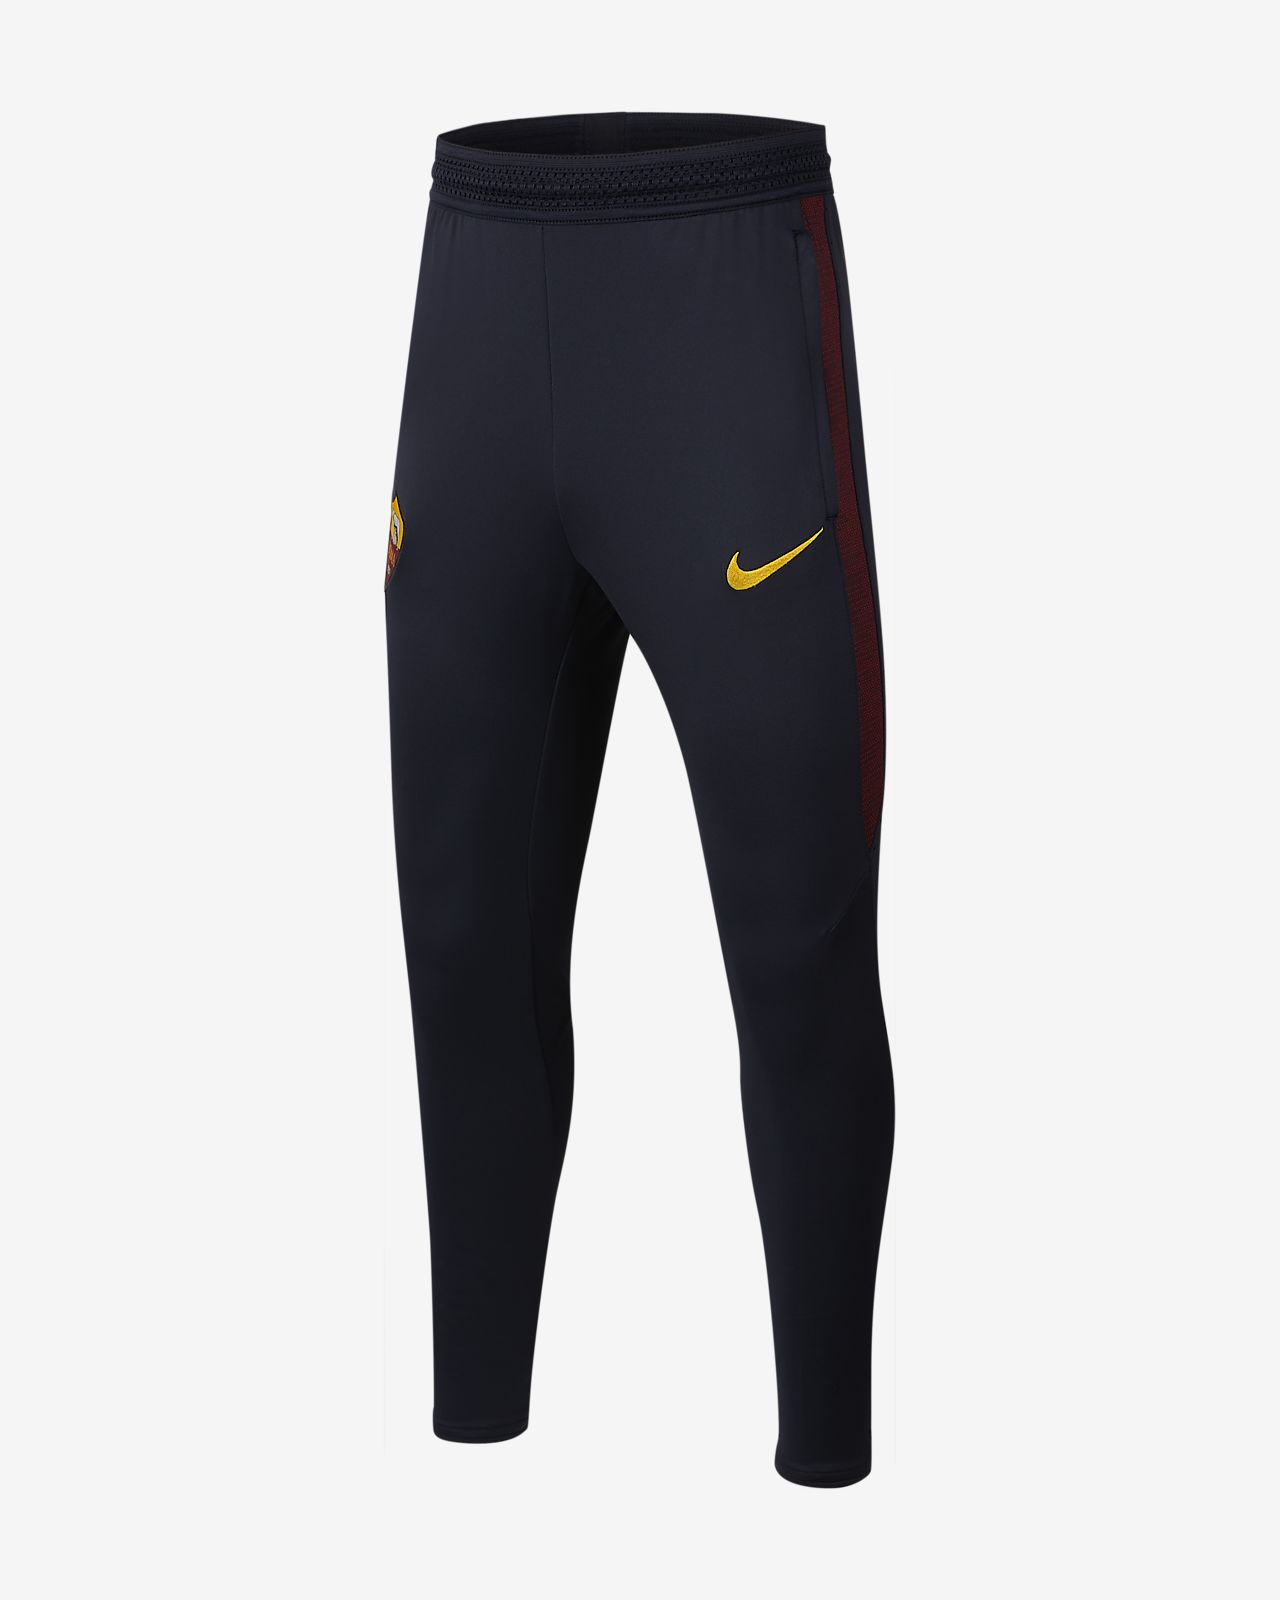 Nike Dri-FIT A.S. Roma Strike Older Kids' Football Pants